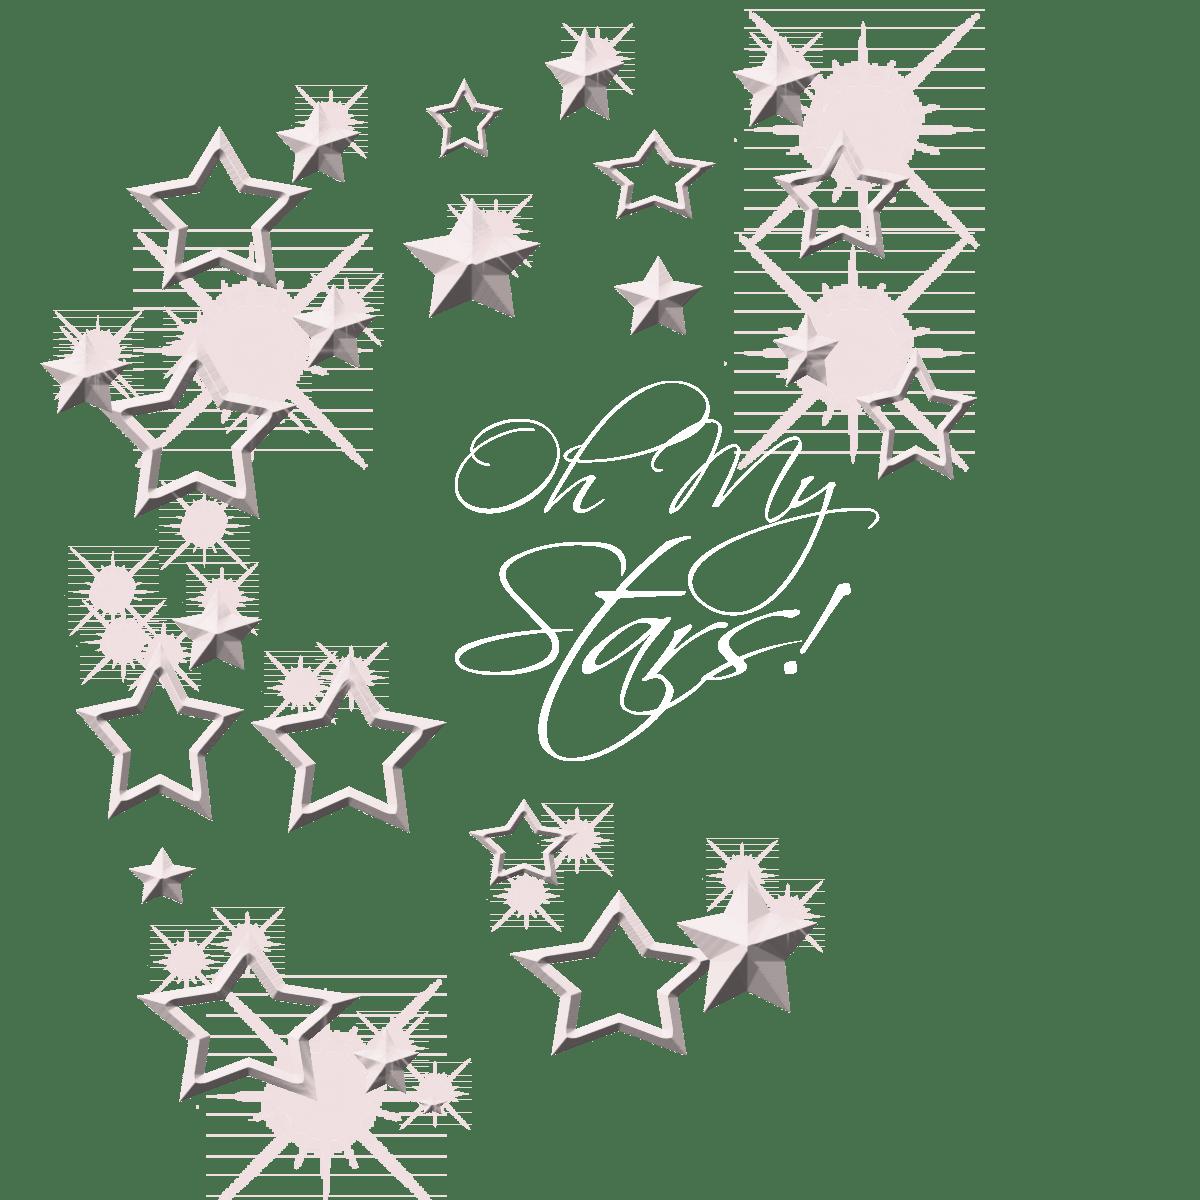 Stars Images Free